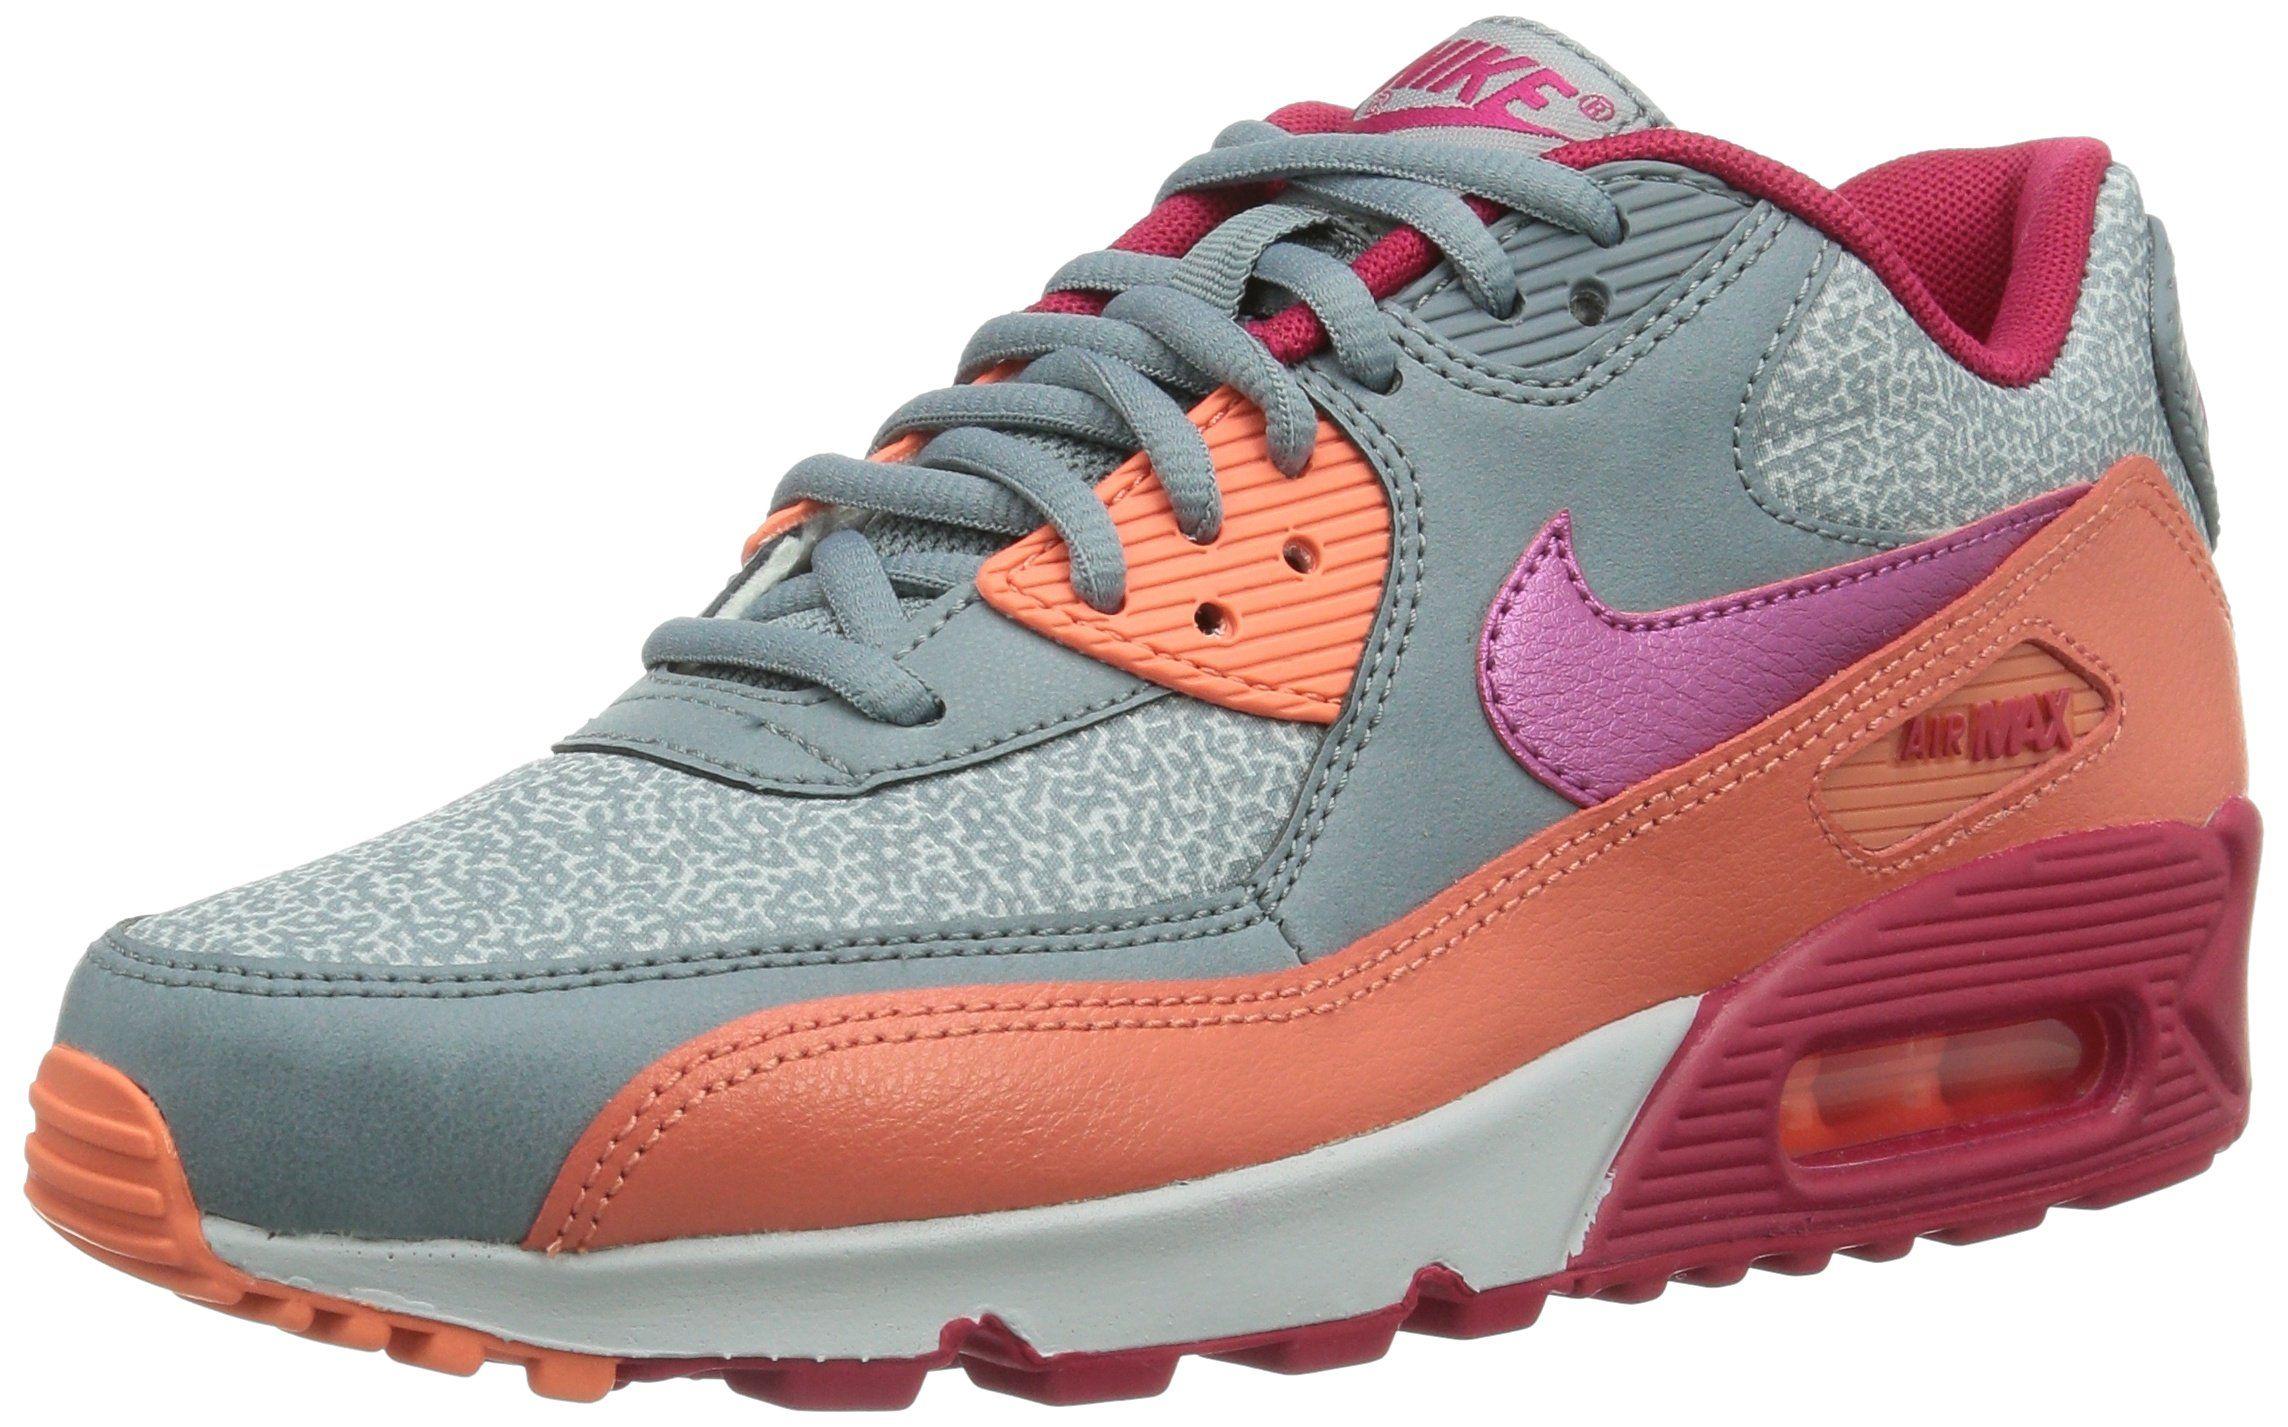 best cheap 0ebbd c38ed Nike Women s Air Max 90 Mgnt Gry Fchs Frc Brght Mng Pr Running Shoe 6 Women  US